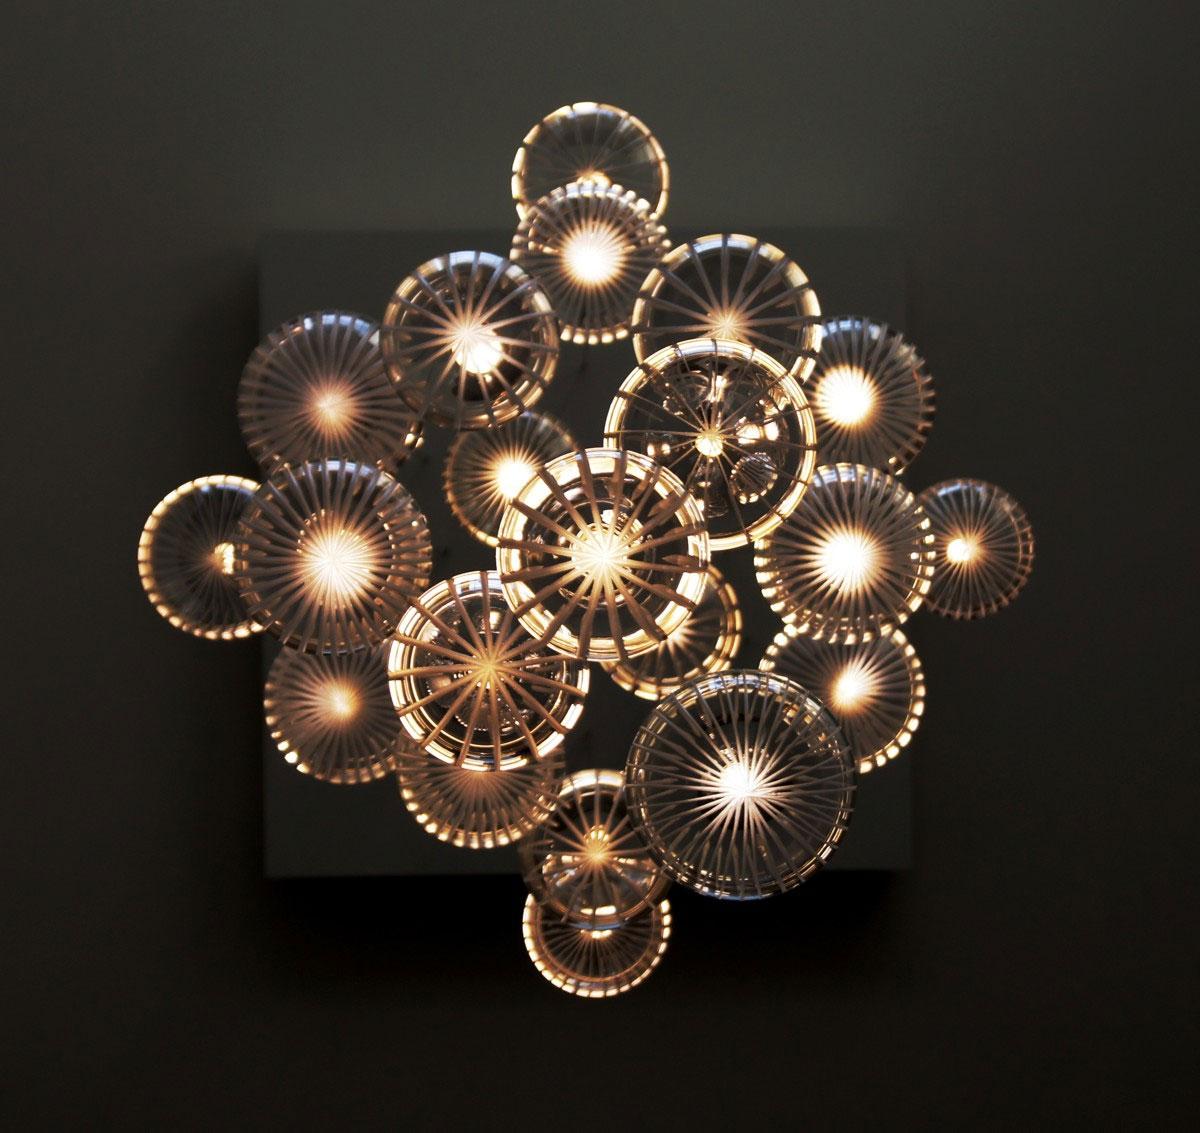 Contemporary Chandelier Design Ideas Inspiration Home Designs With Contemporary Chandelier (Image 10 of 15)